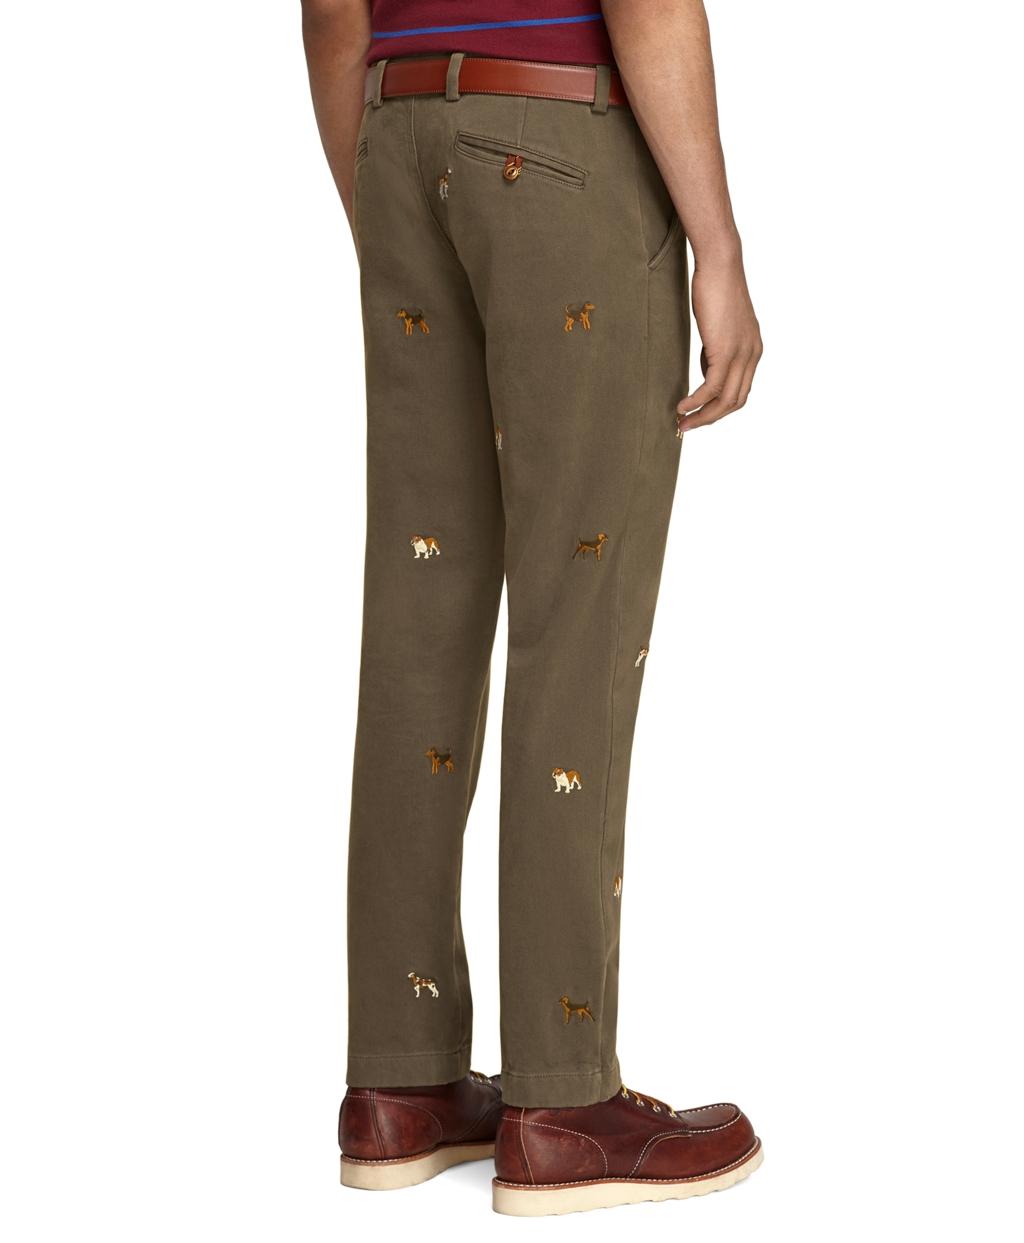 Brooks Brothers Red Fleece Men's Corduroy Pants Camel Tan - Size 38x29